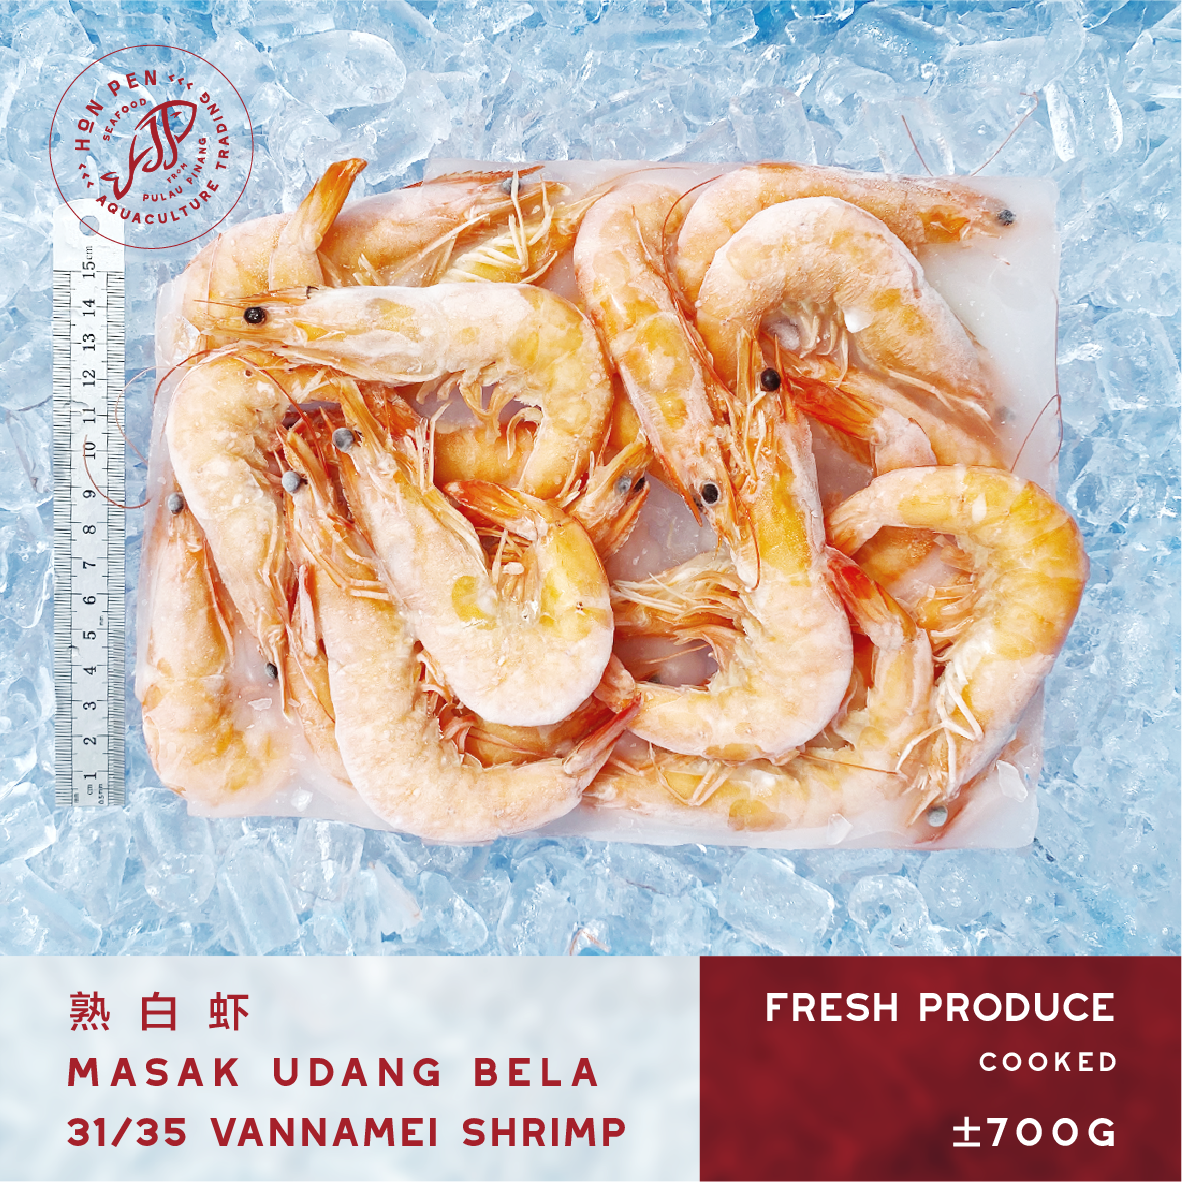 VANNAMEI SHRIMP 31/35 熟白虾 UDANG BELA (Cooked) ±700g